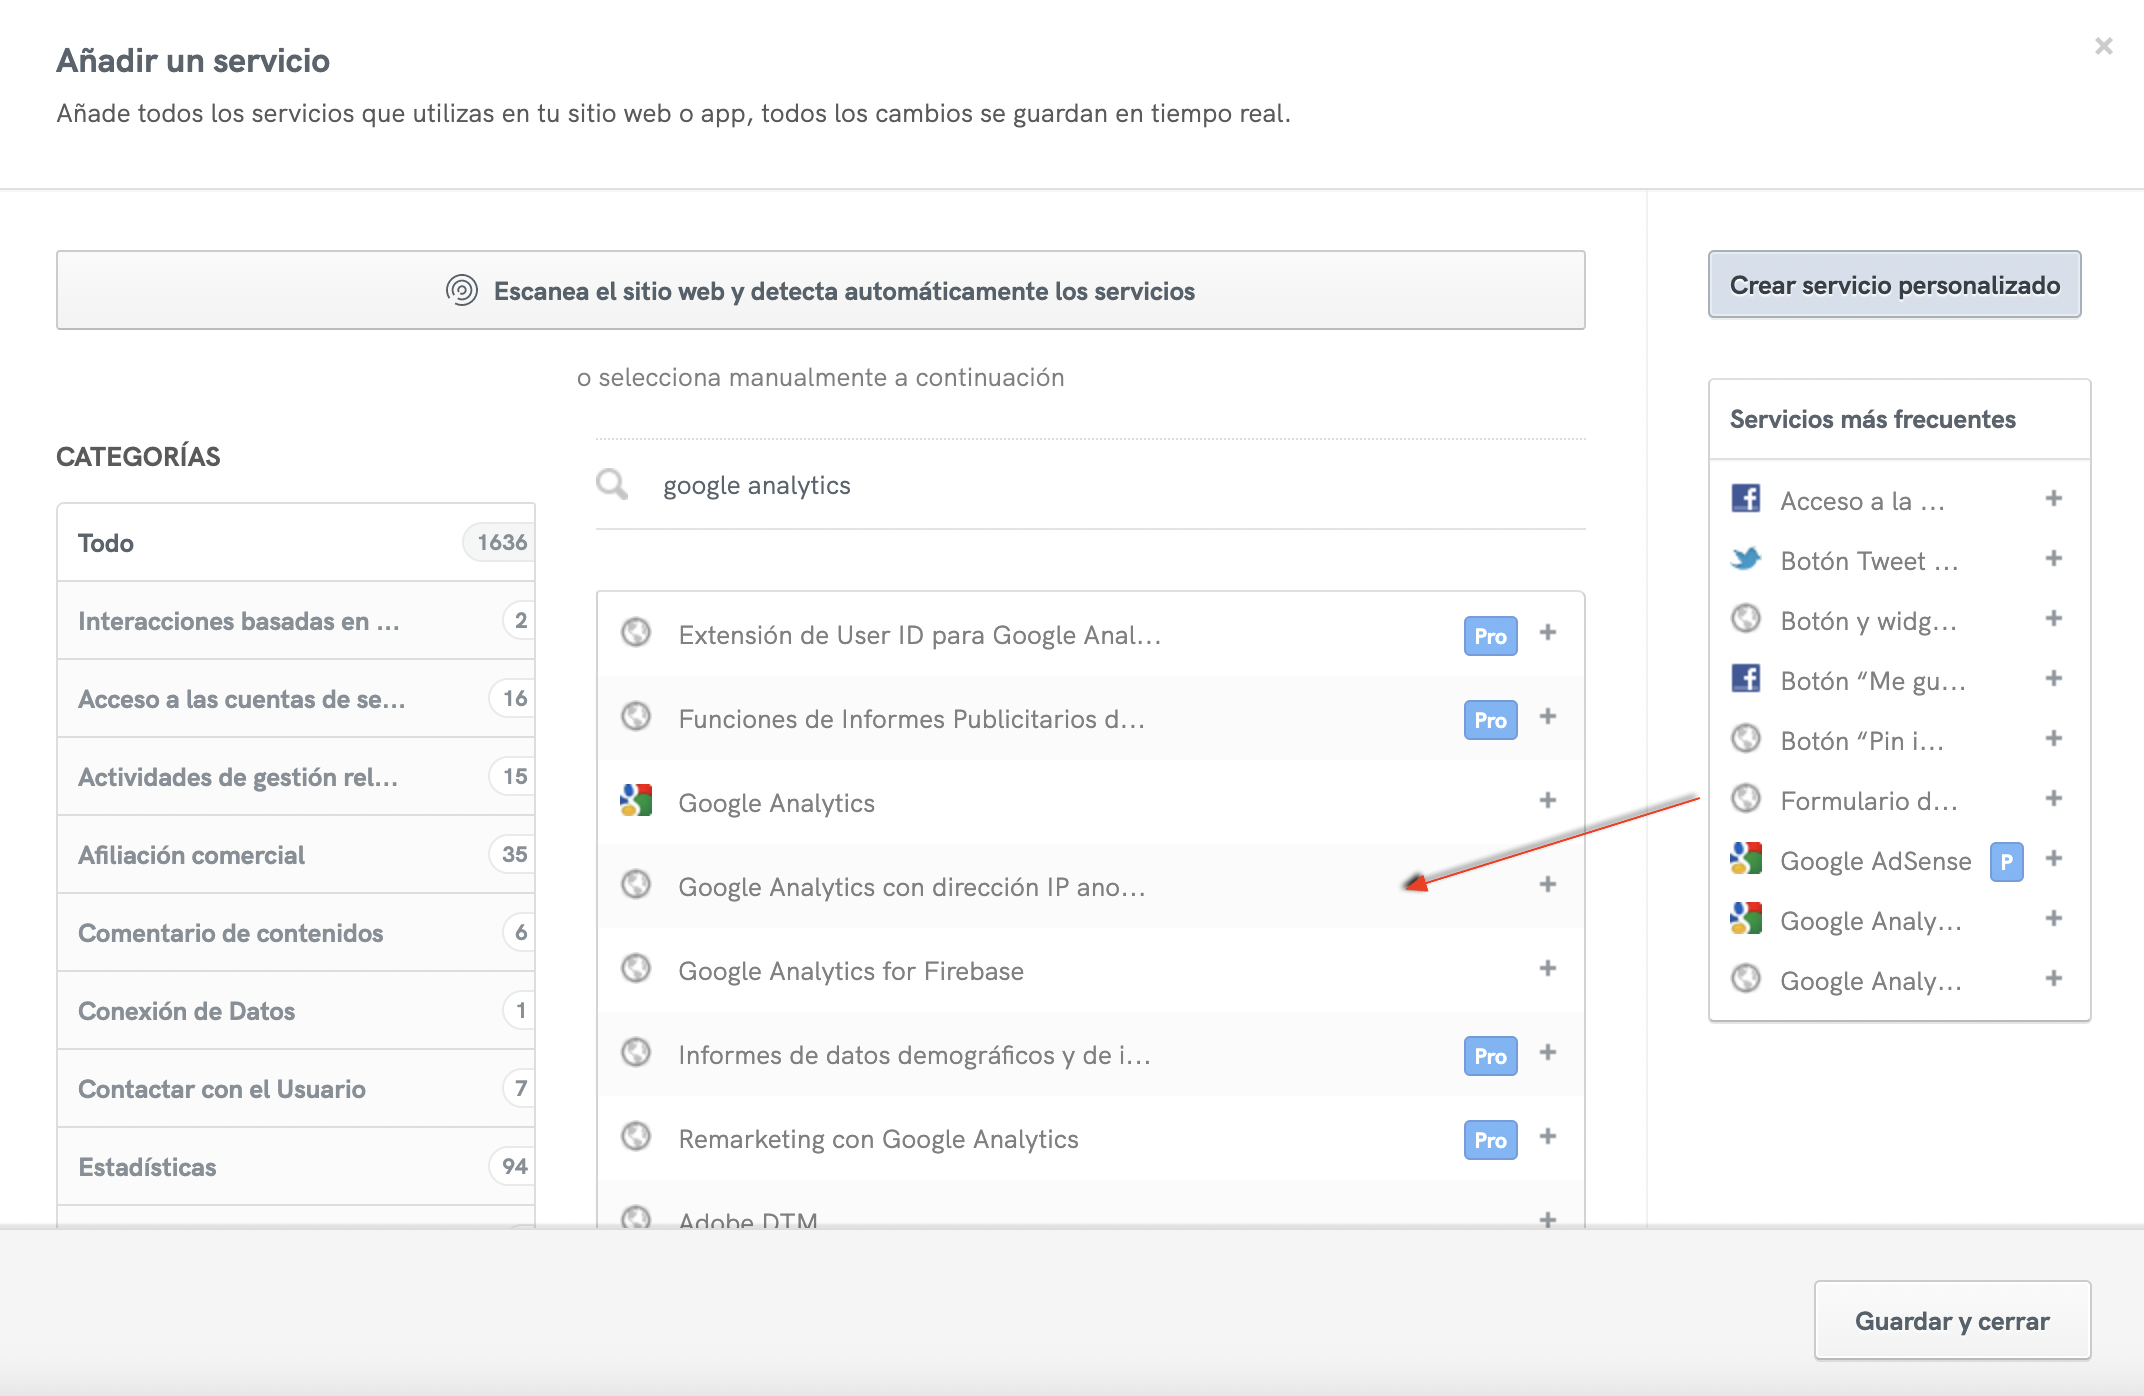 Google Analytics with anonymized IP